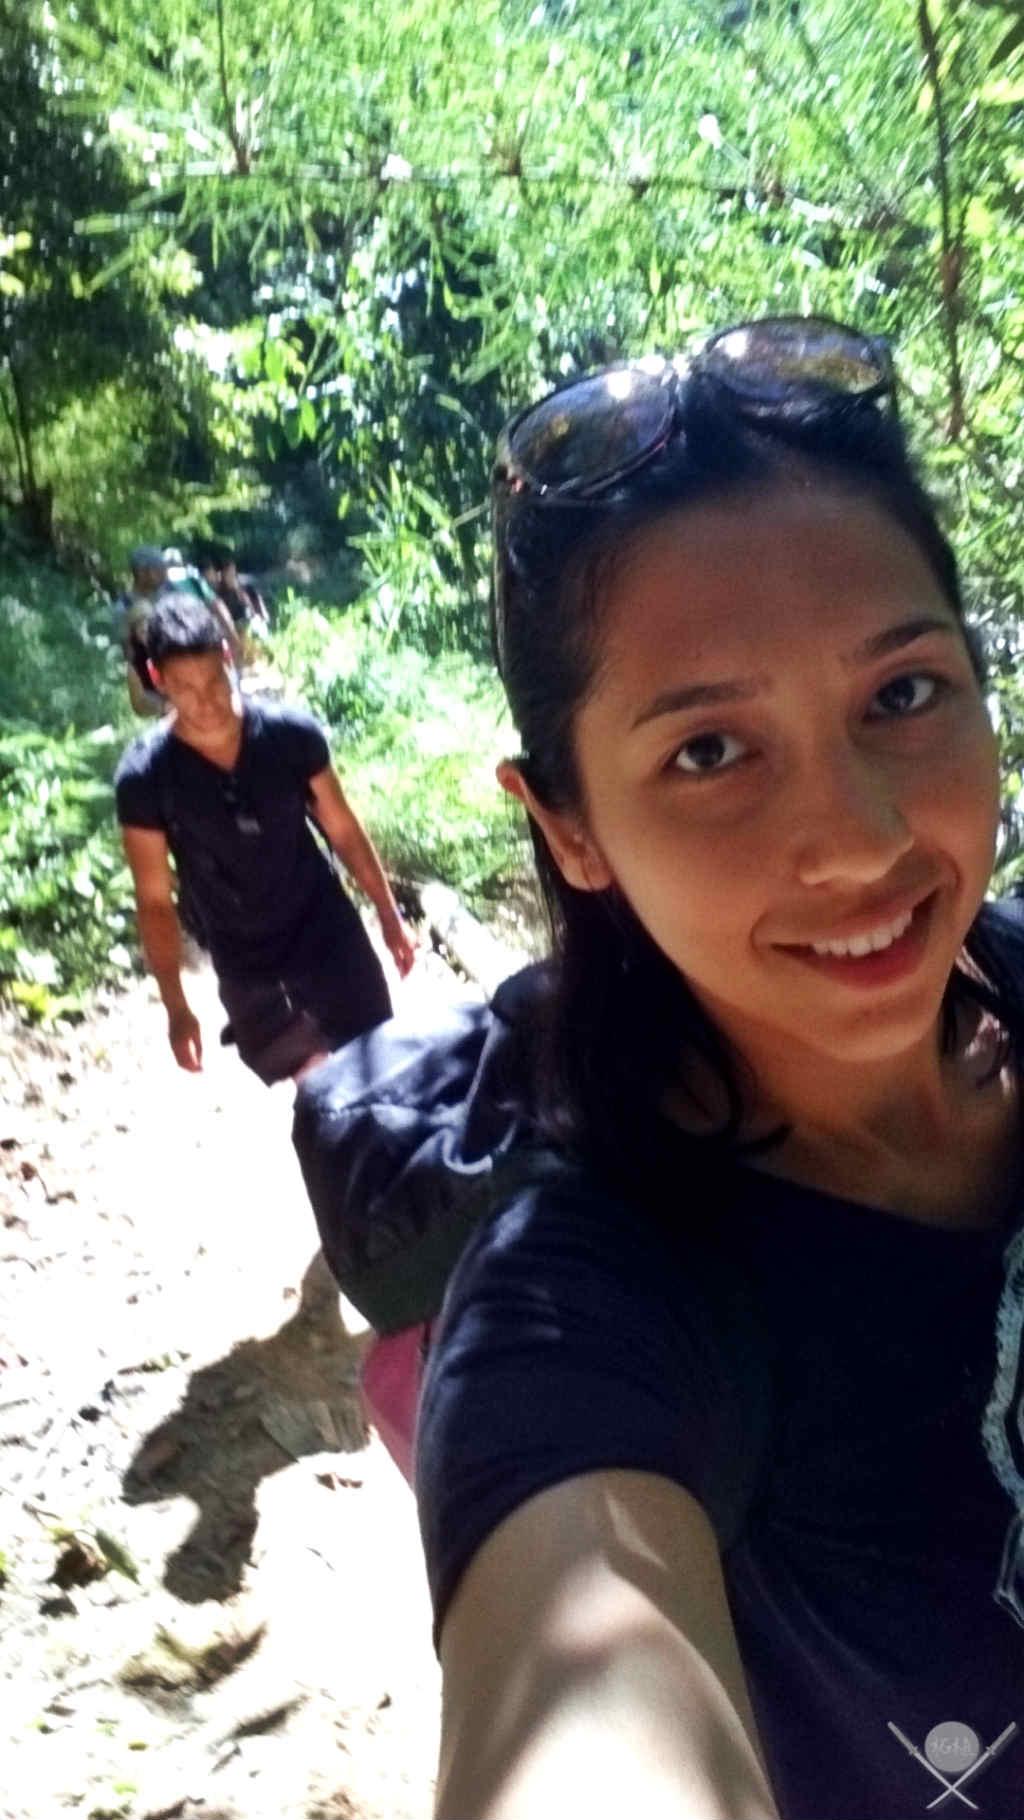 Thailand - Chiang Mai - Trekking Trilha 1 - Viagens - Vida de Tsuge - VDT